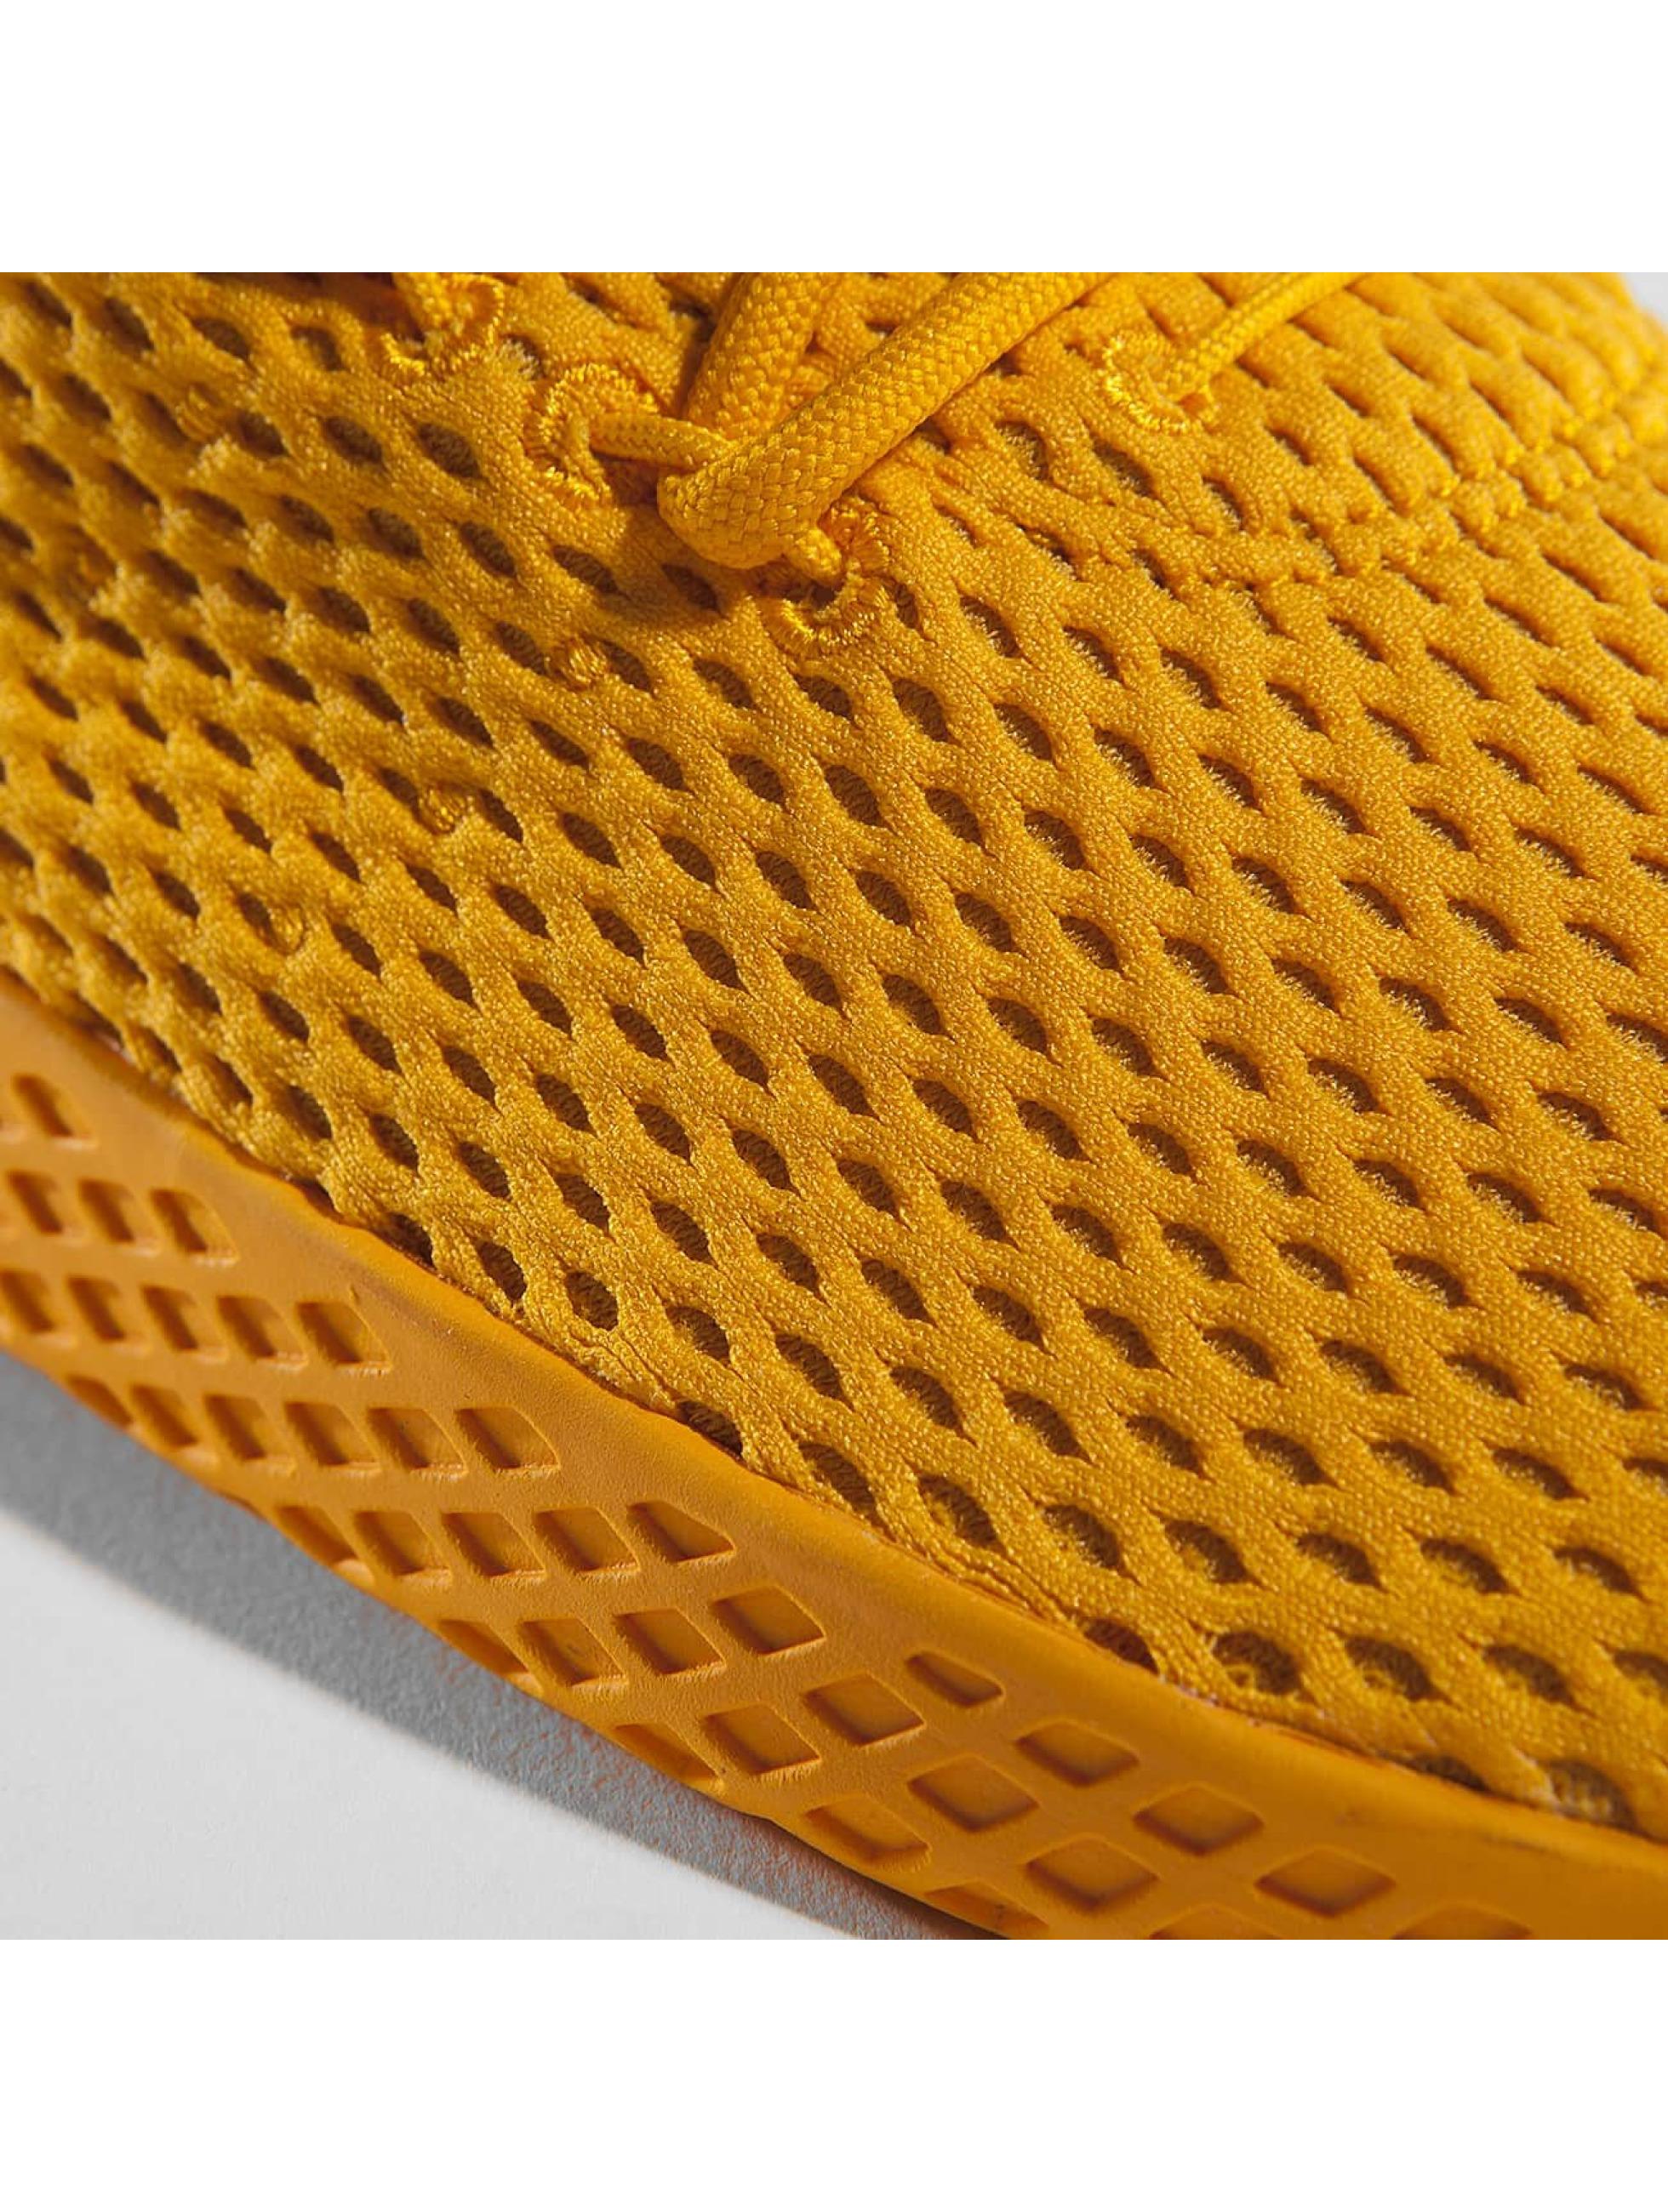 adidas originals Sneakers Pharrell Williams Tennis Hu zloty